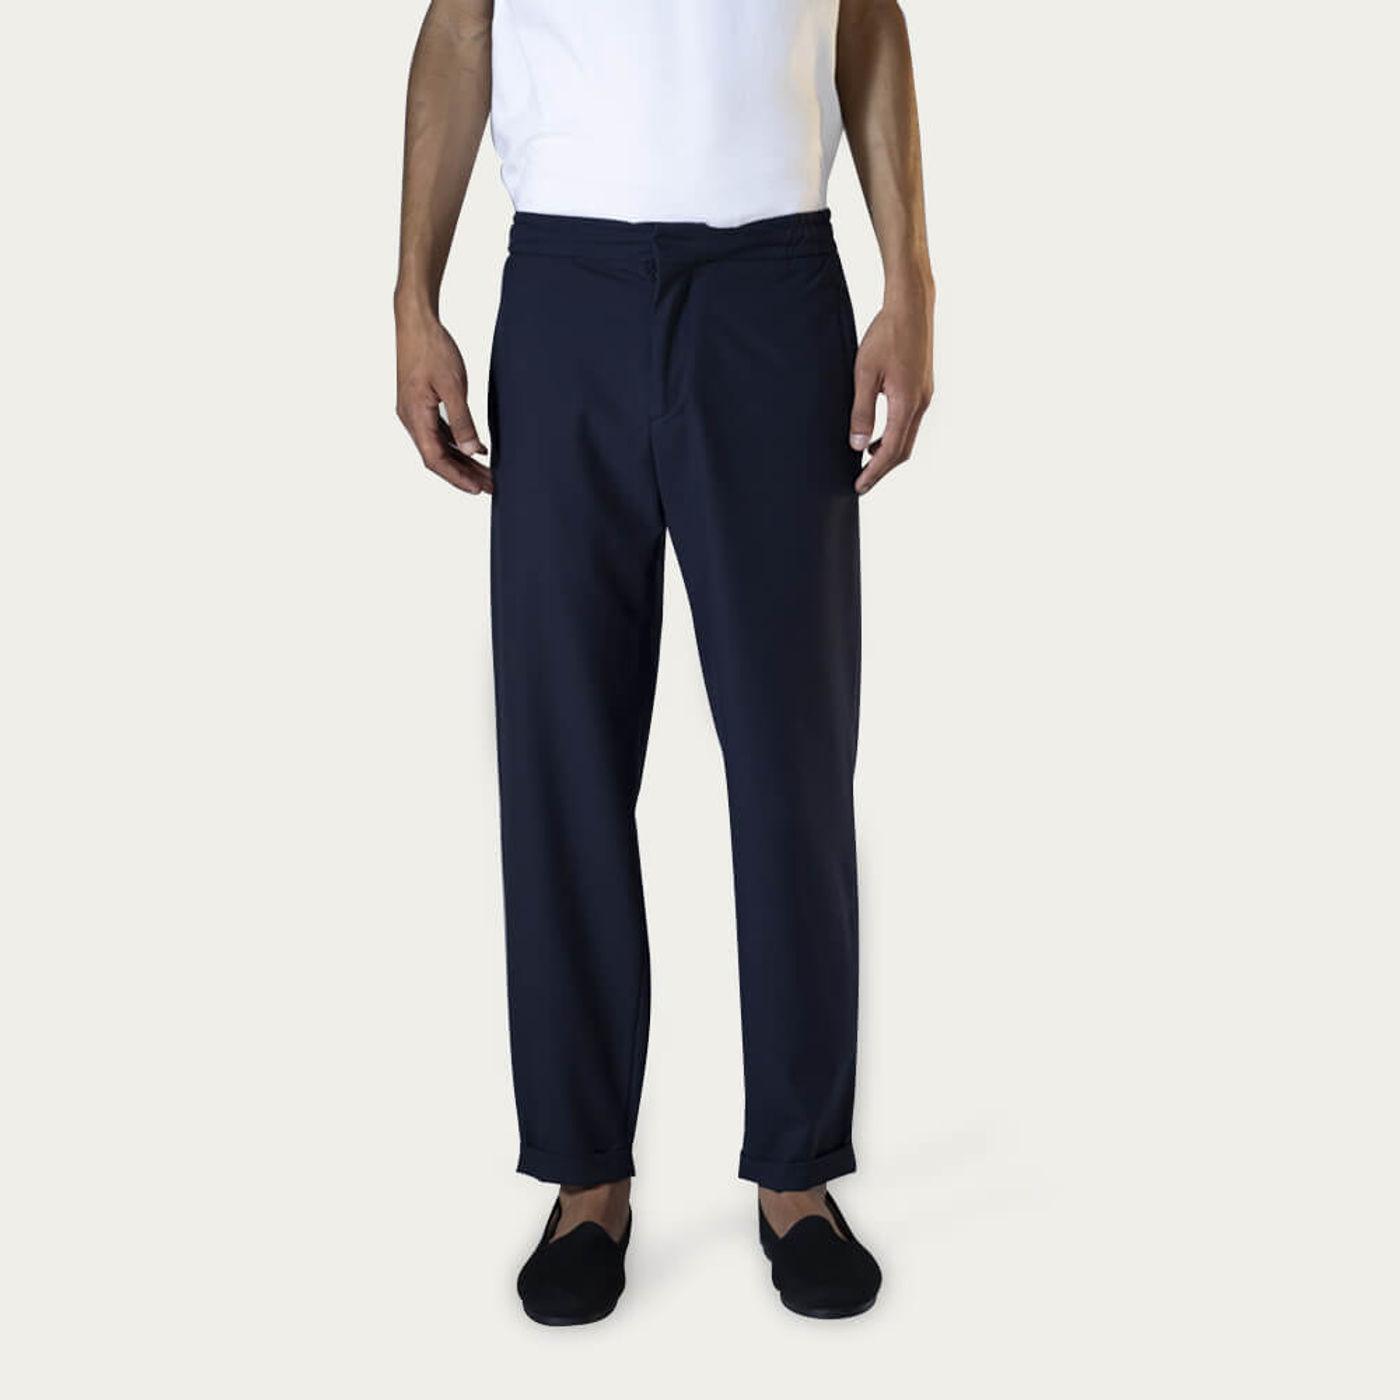 Navy Tailor Pants | Bombinate